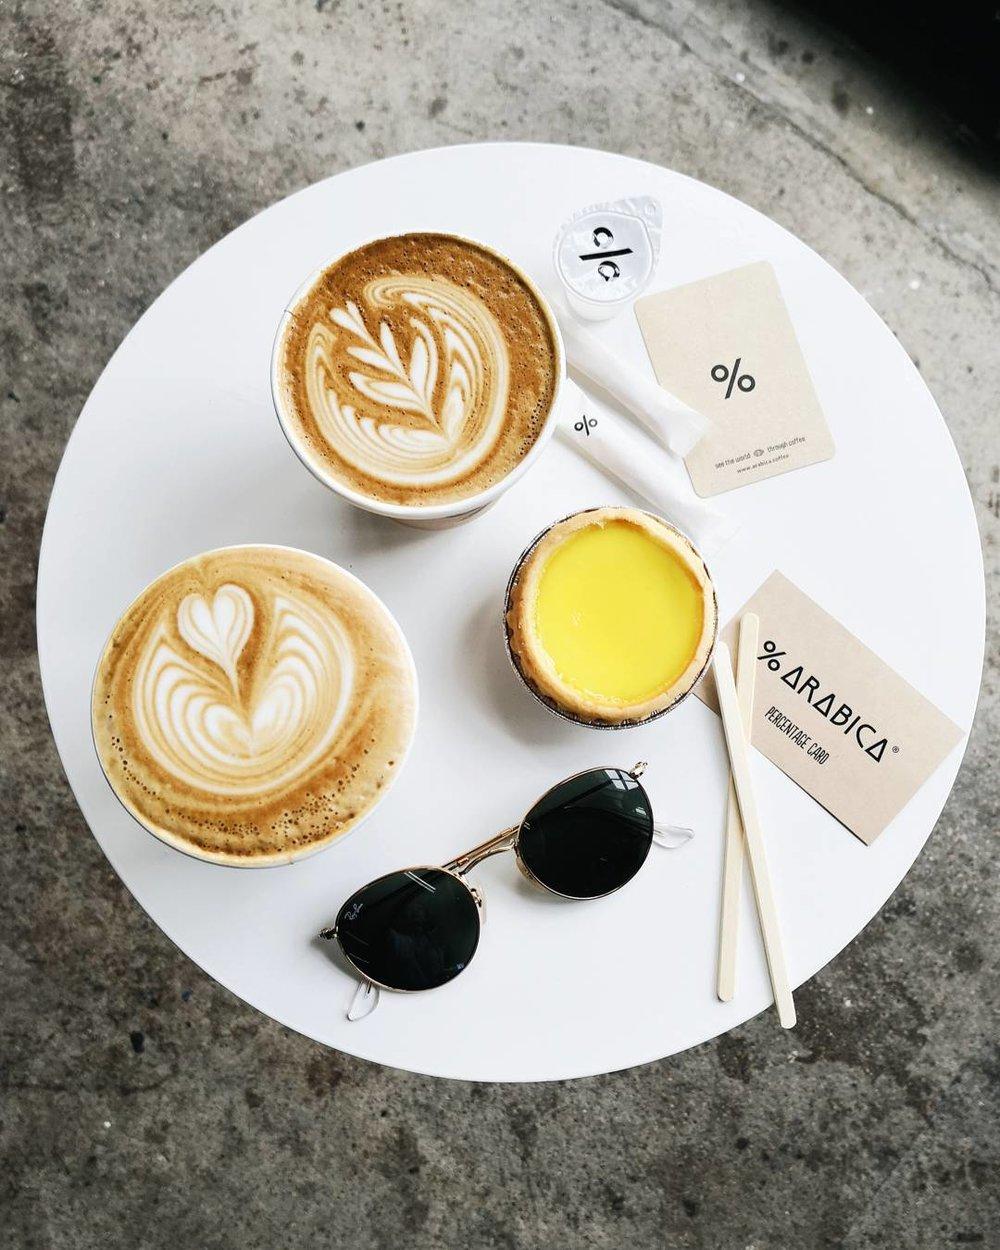 arabica-coffee-hong-kong-01.jpg